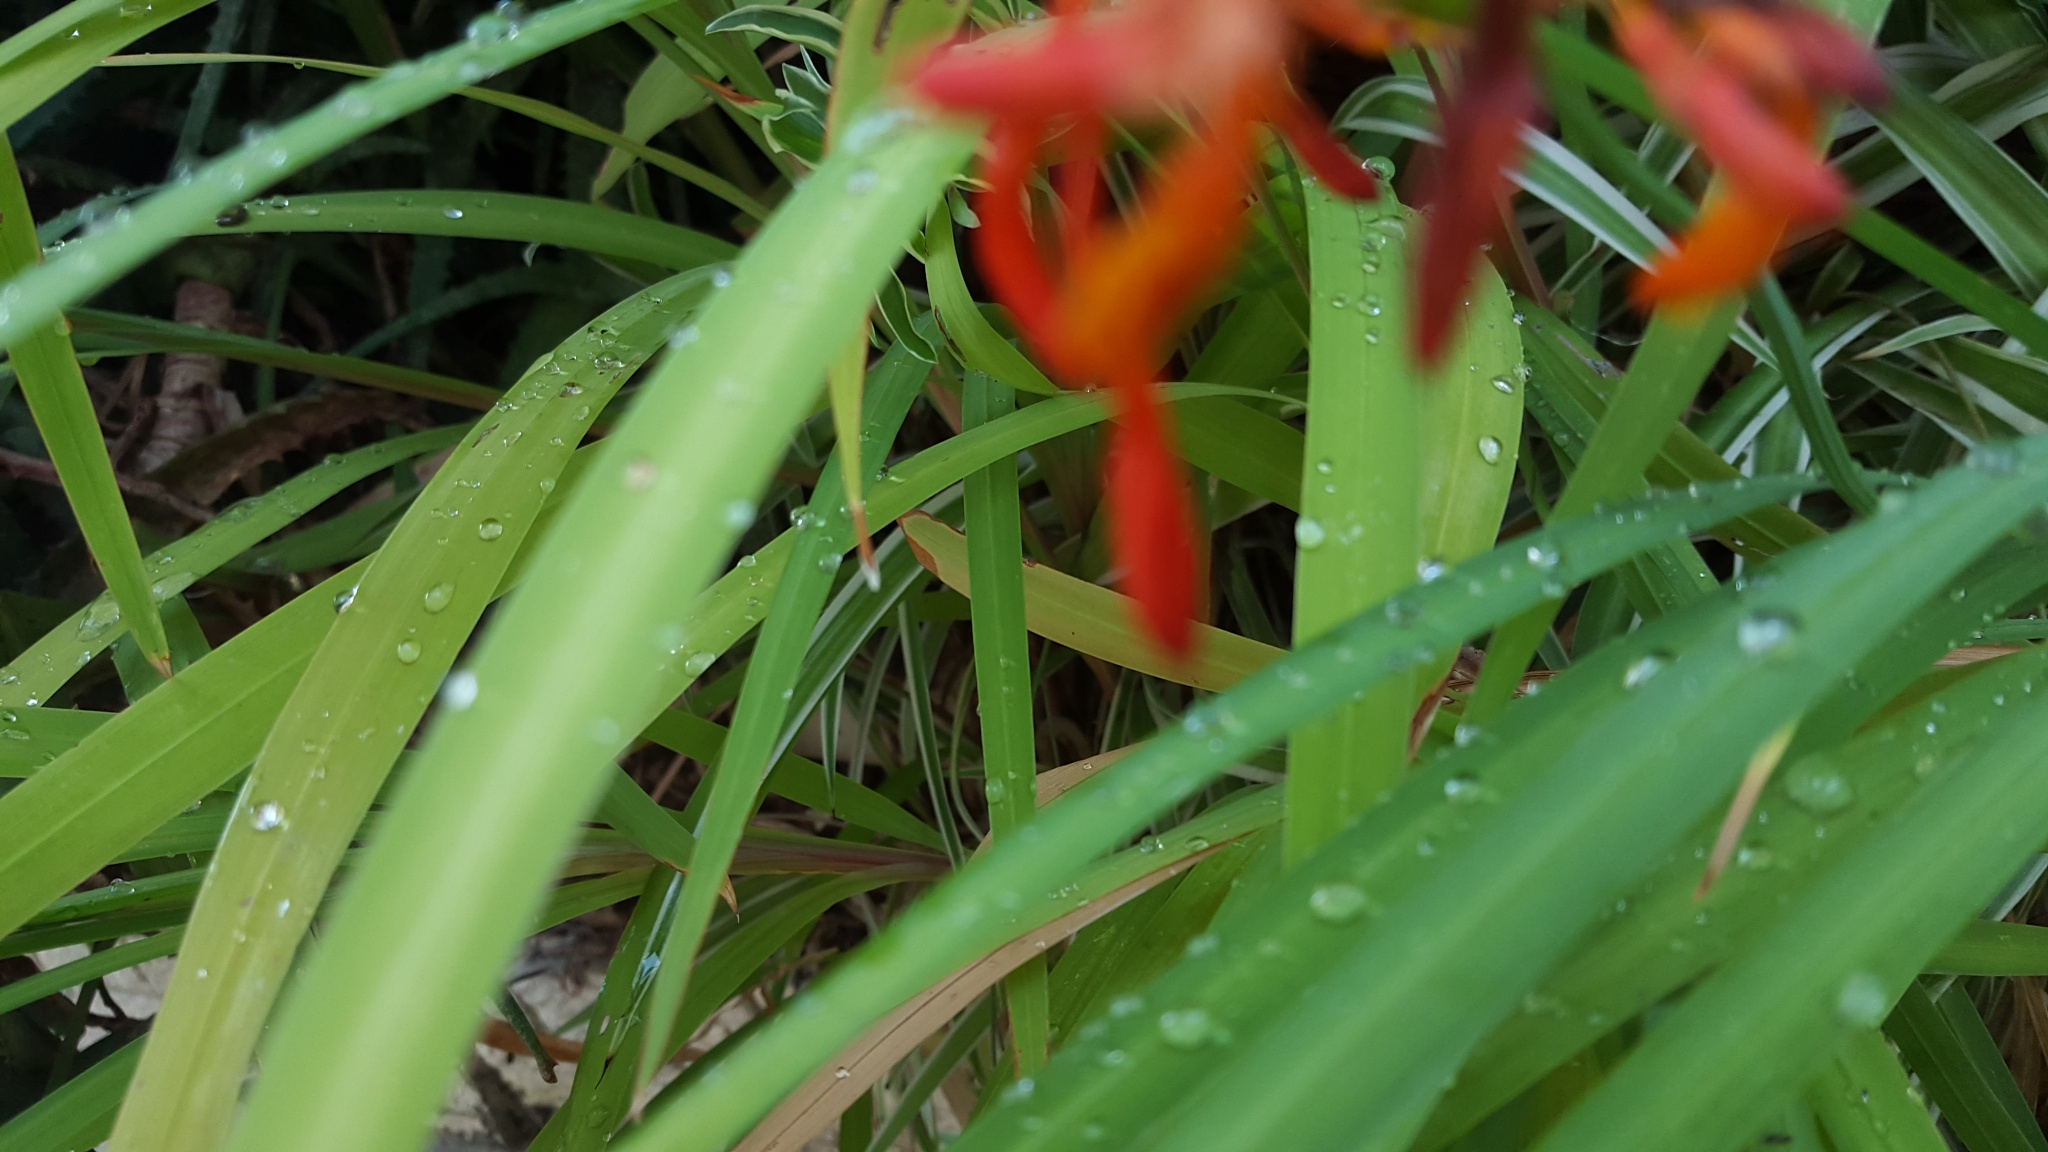 Water drops by Seekatjie